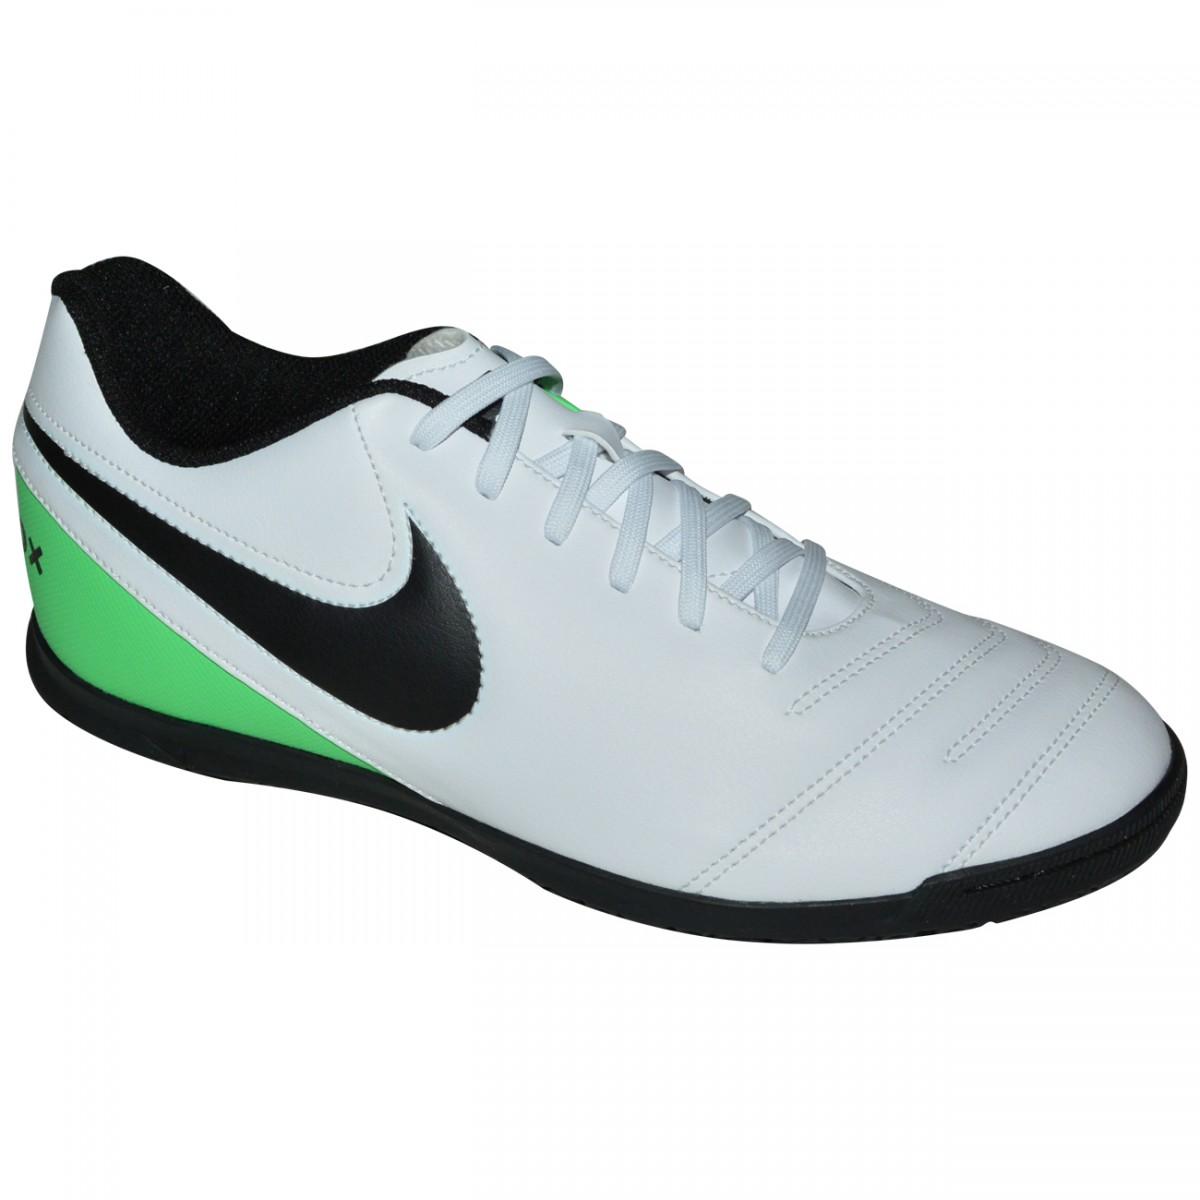 4b7599aebc1c9 Tenis Nike Tiempox Rio III 819234 103 - Branco Preto Verde - Chuteira Nike